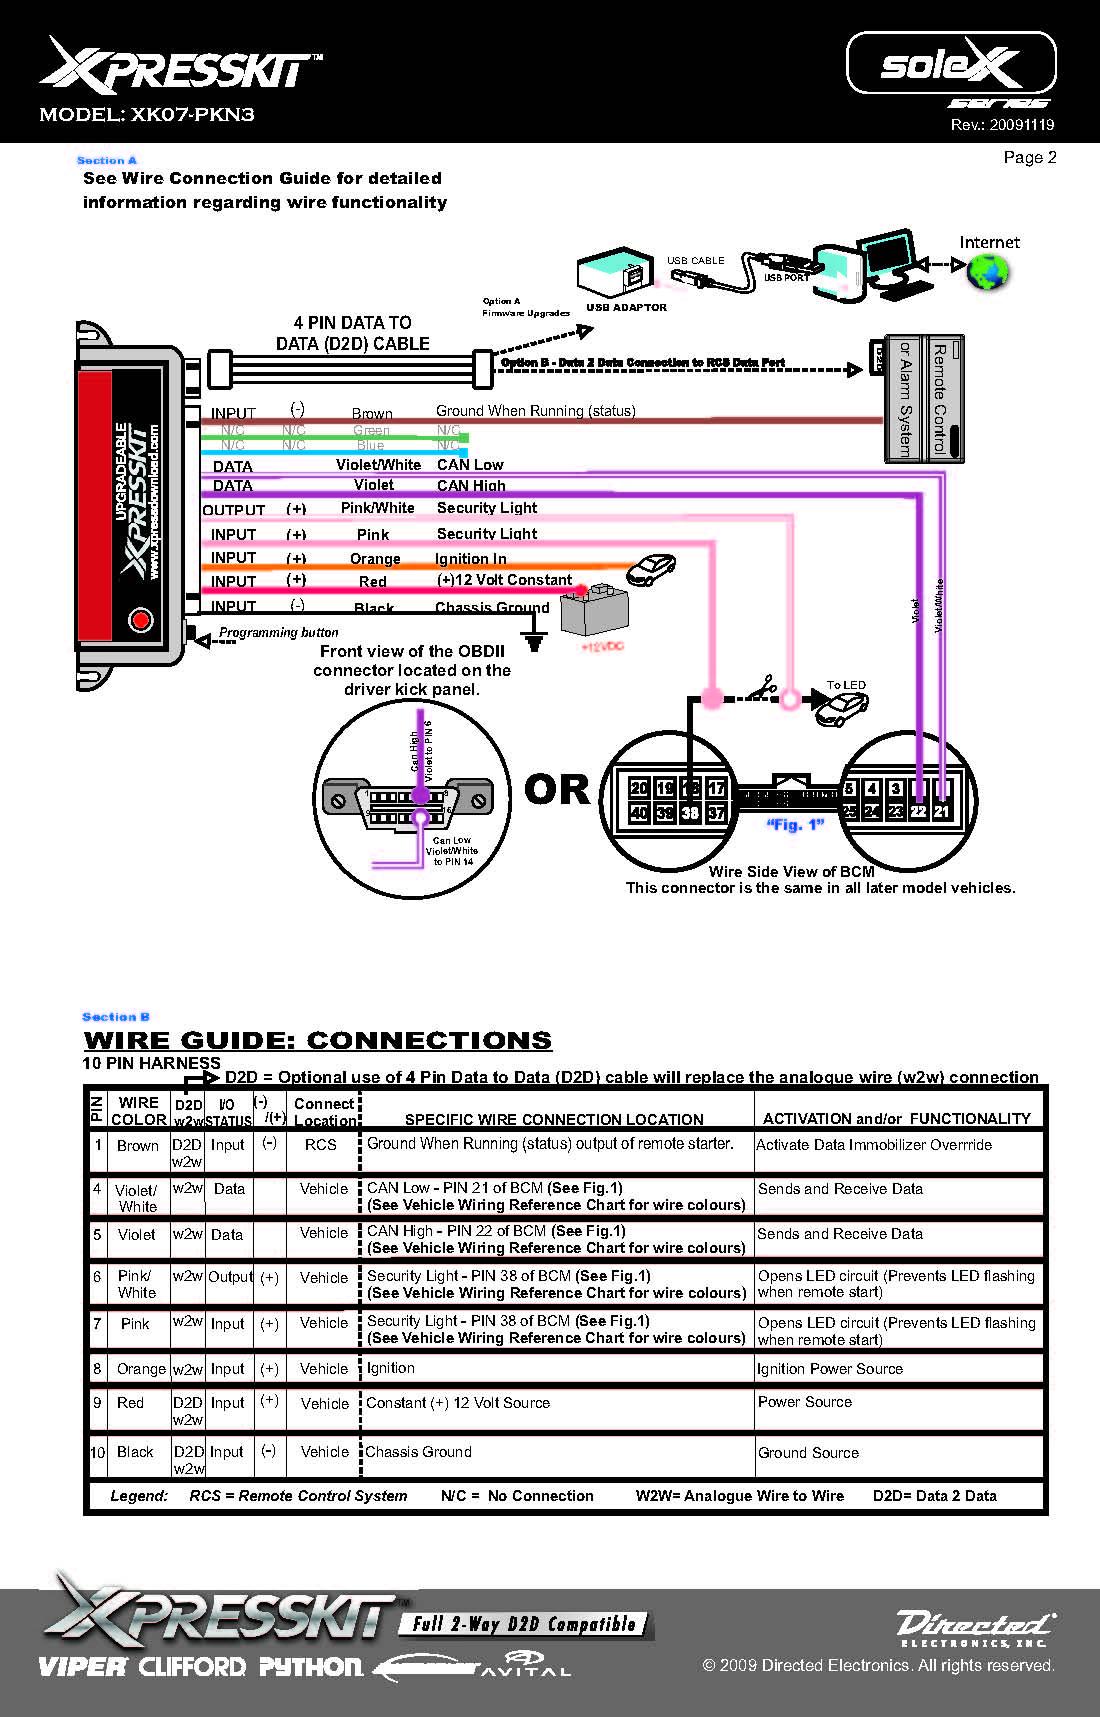 Viper 5901 Wiring Harness - Wiring Diagrams Blogpalox-france.fr